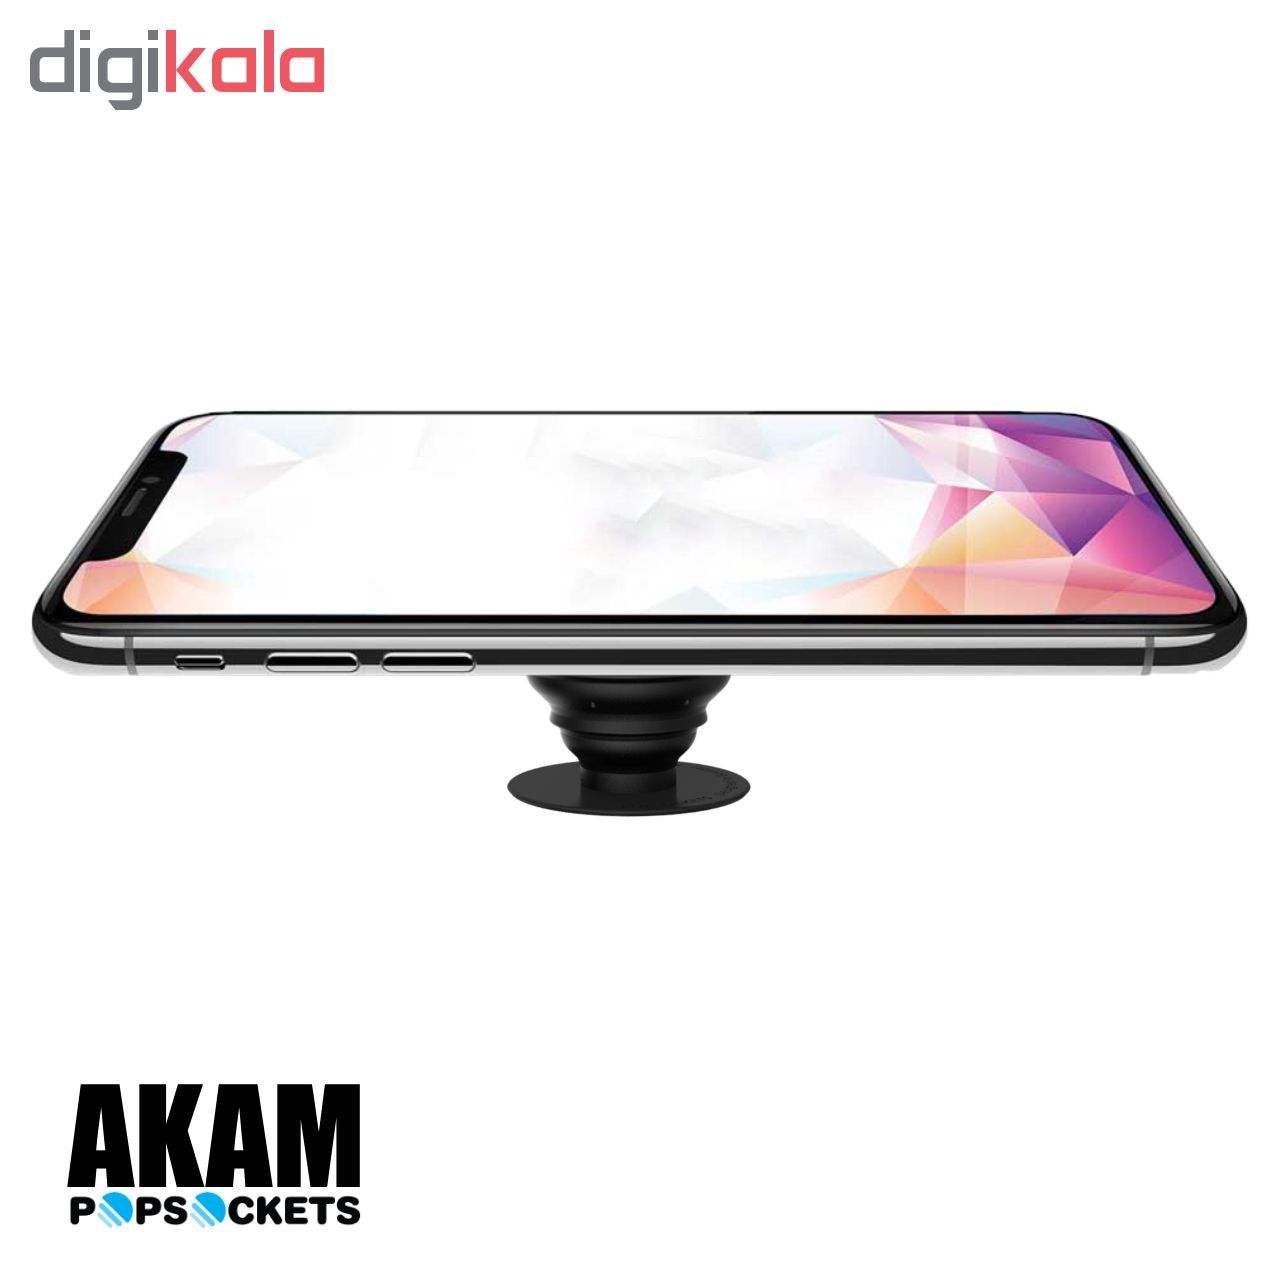 پایه نگهدارنده گوشی موبایل پاپ سوکت آکام مدل APS0057 main 1 10